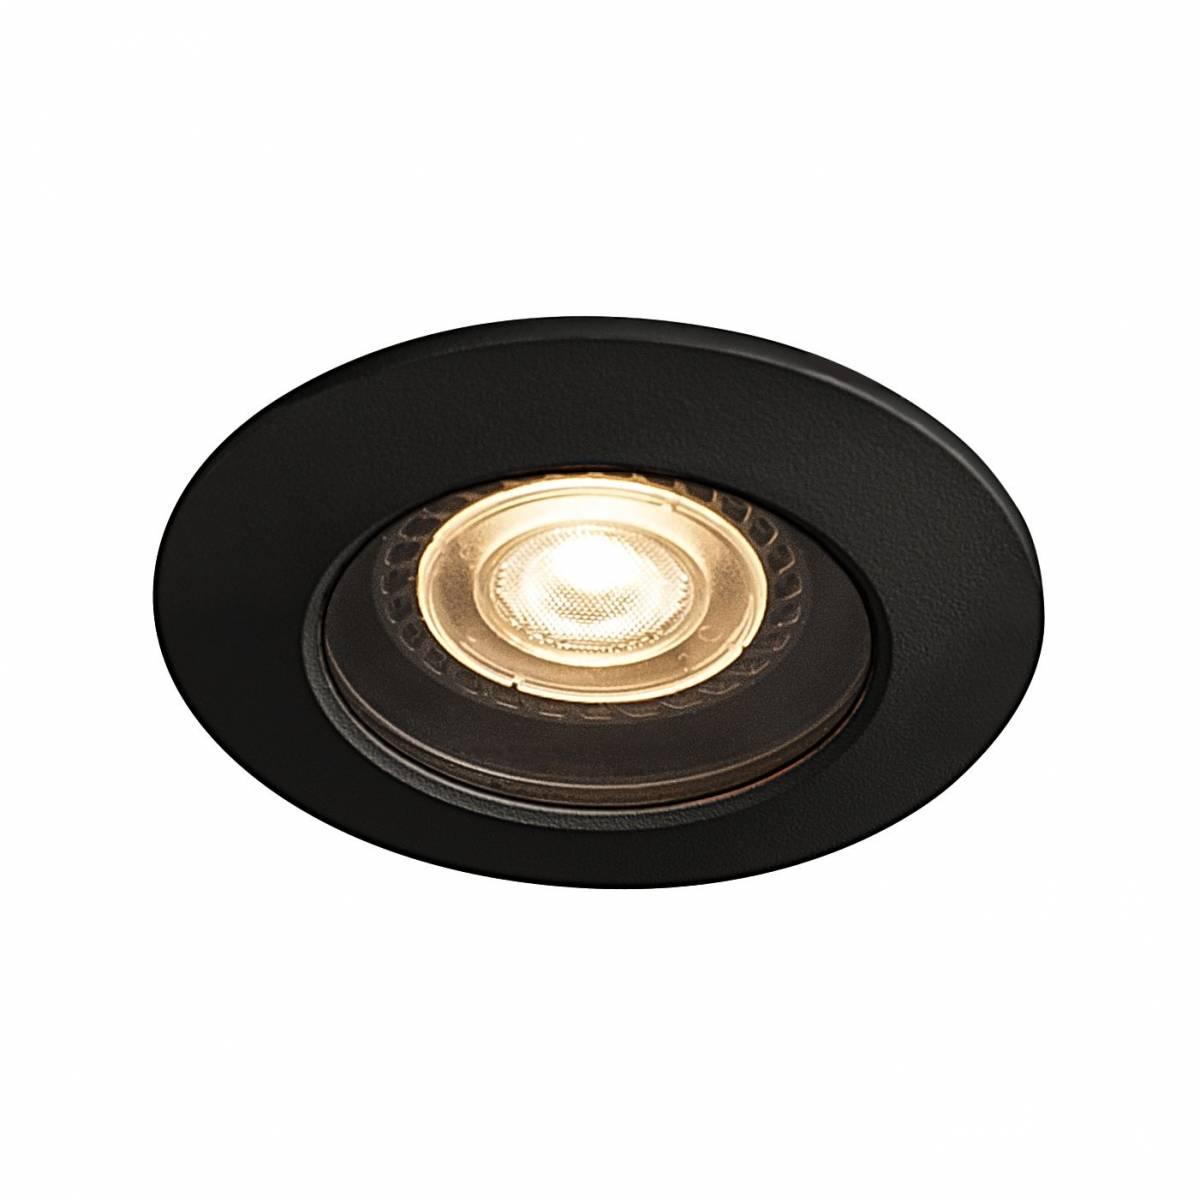 VARU QPAR51 DL, black, IP20/65